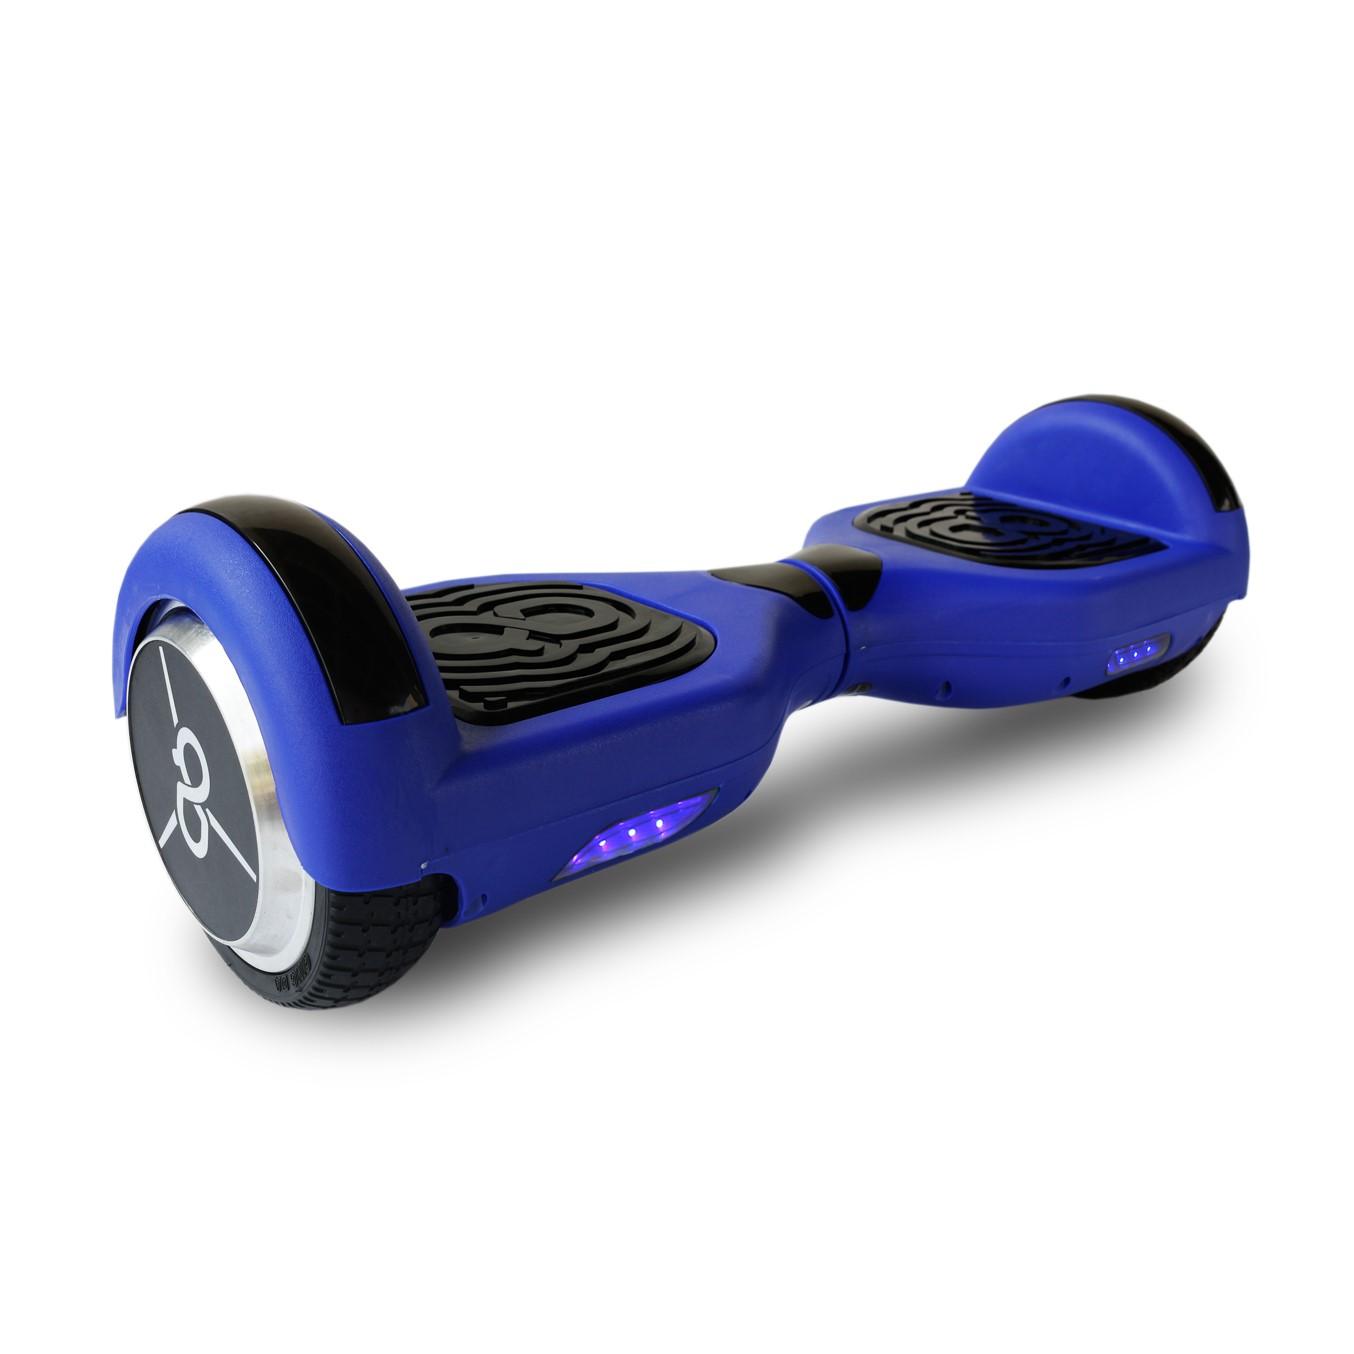 "Hoverboard skateflash k6+b azul rueda 6.5"" bateria"